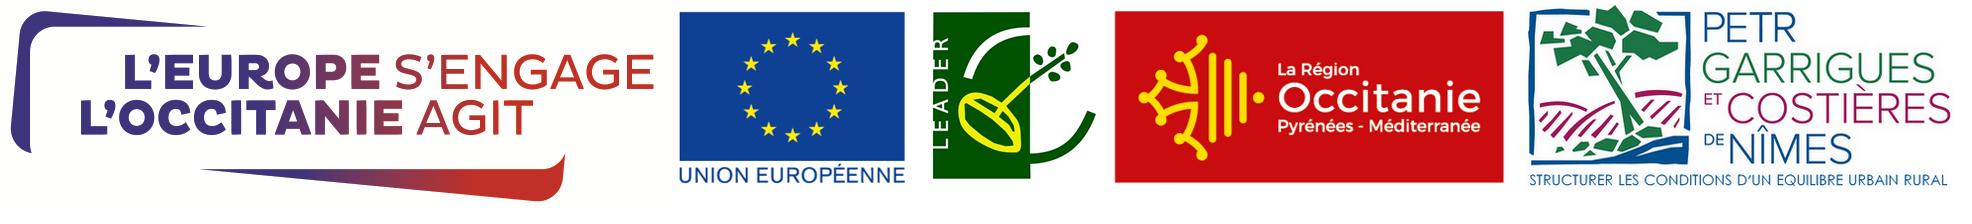 Bandeau_logos_diffusion+GAL PETRv2